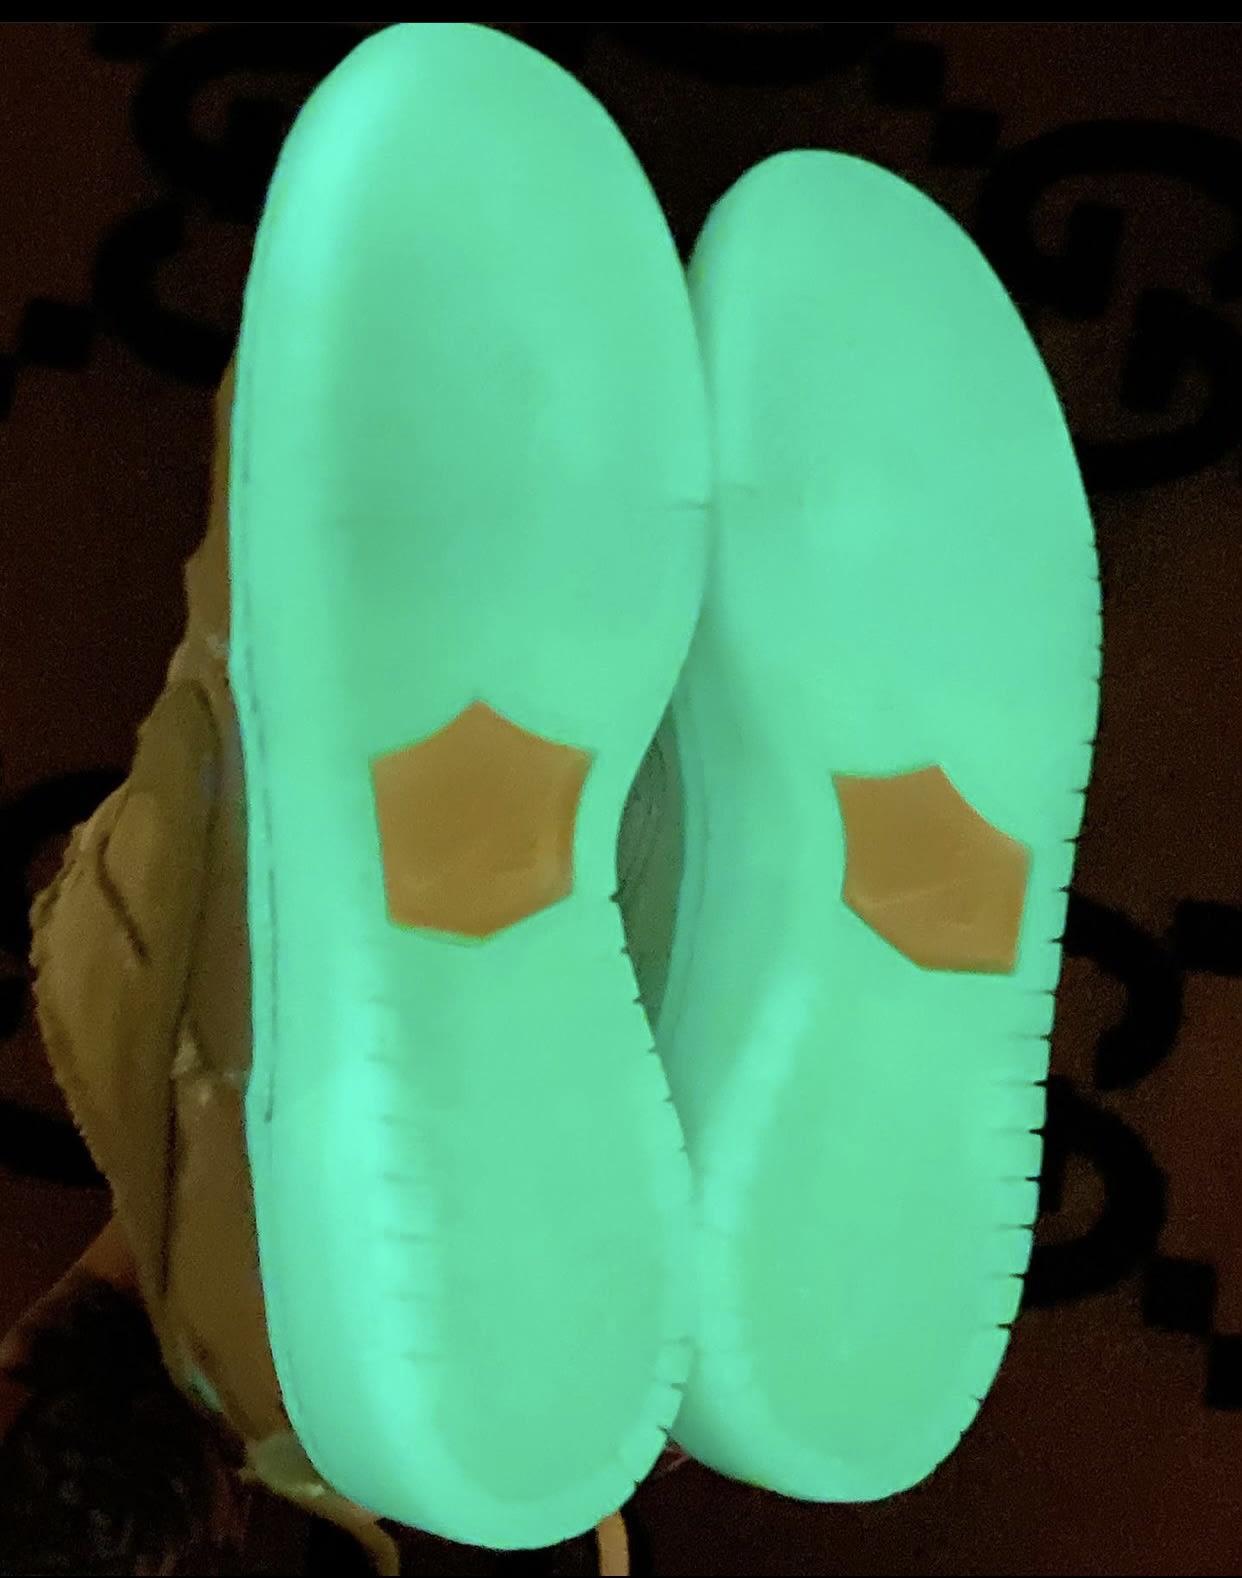 Nike SB Dunk Low Mummy Halloween DM0774-111 Glow Sole Bottom